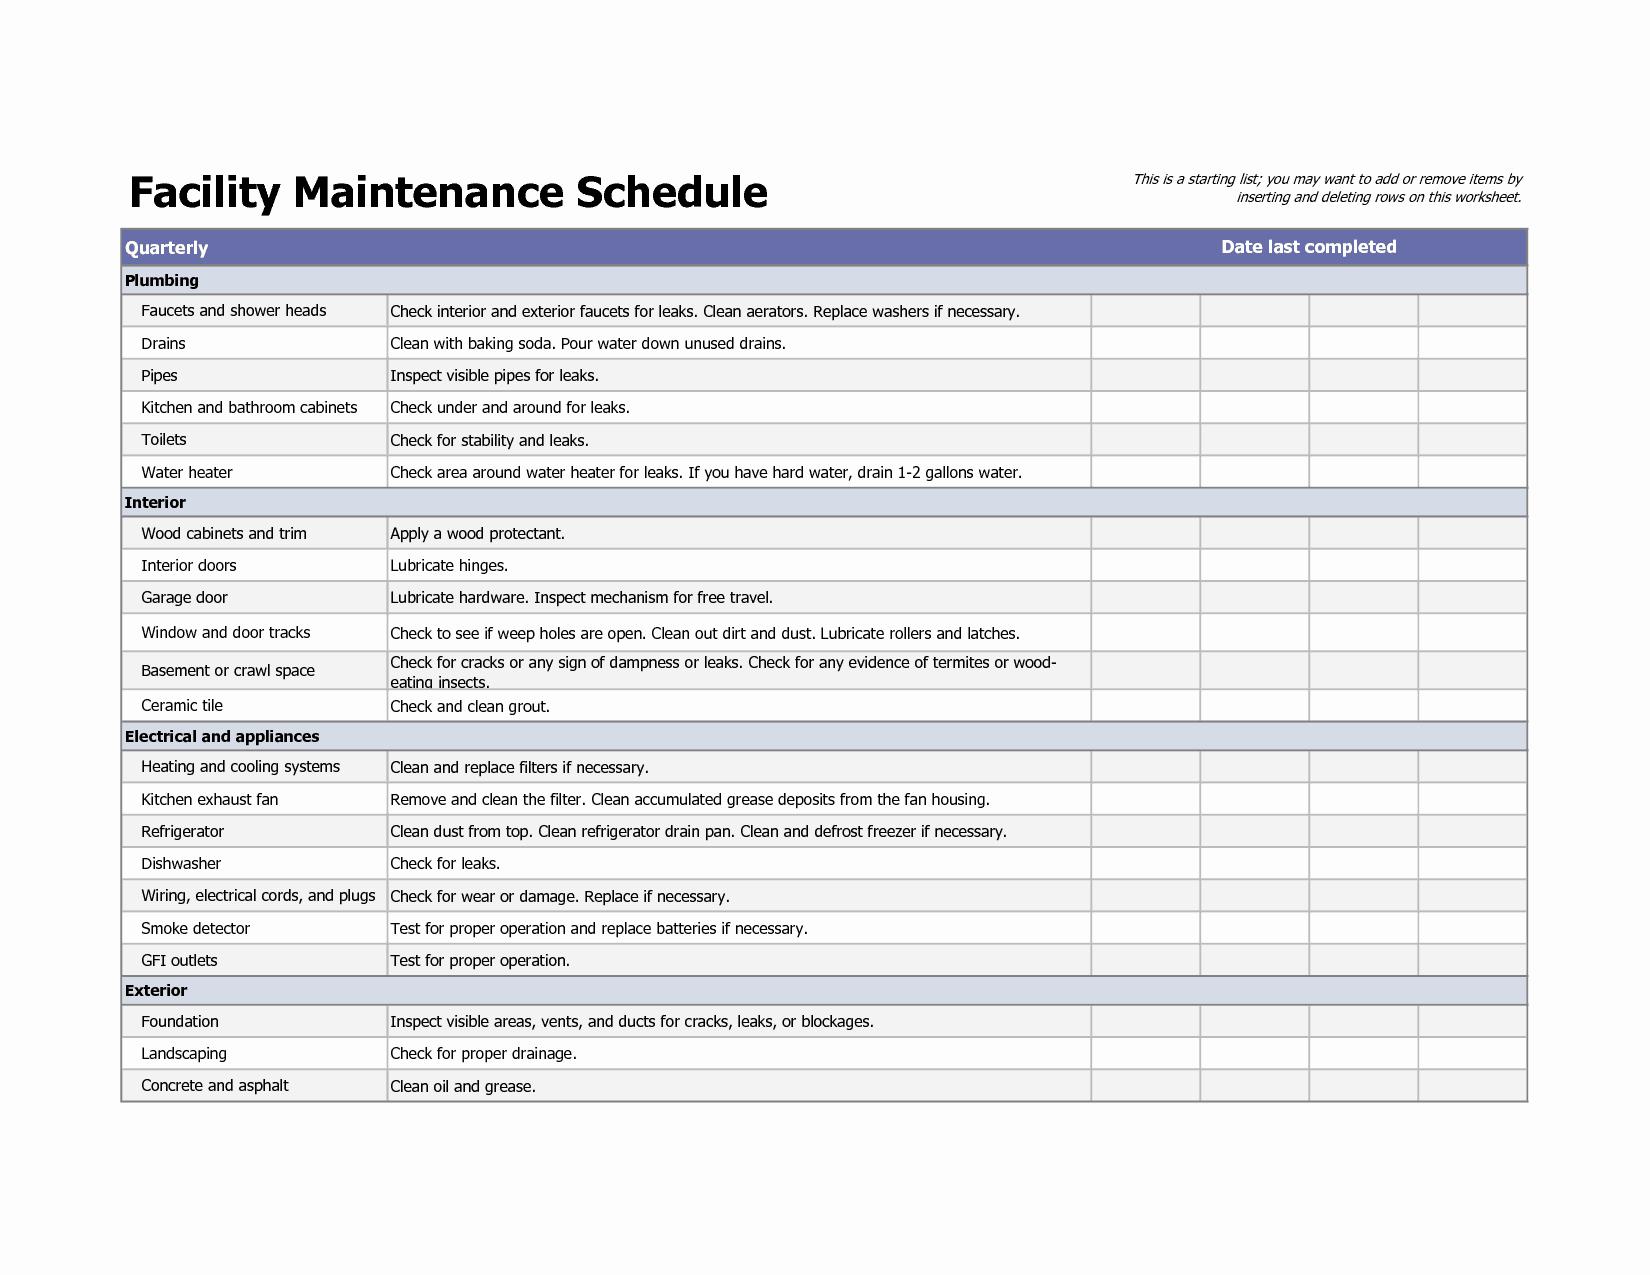 Facility Maintenance Checklist Template Unique 4 Facility Maintenance Checklist Templates Excel Xlts